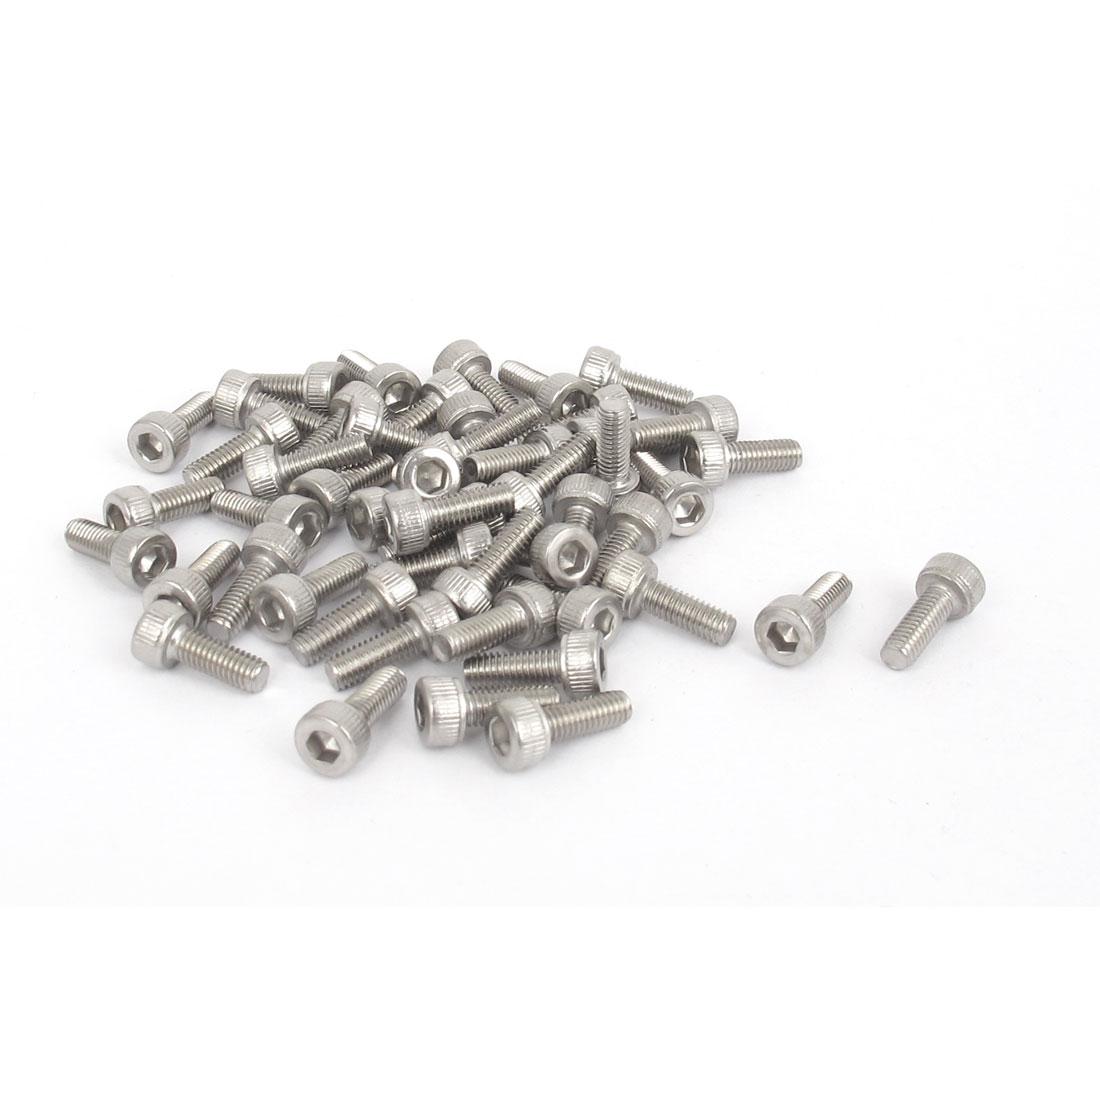 M3x8mm Thread 304 Stainless Steel Hex Key Bolt Socket Head Cap Screws 50pcs